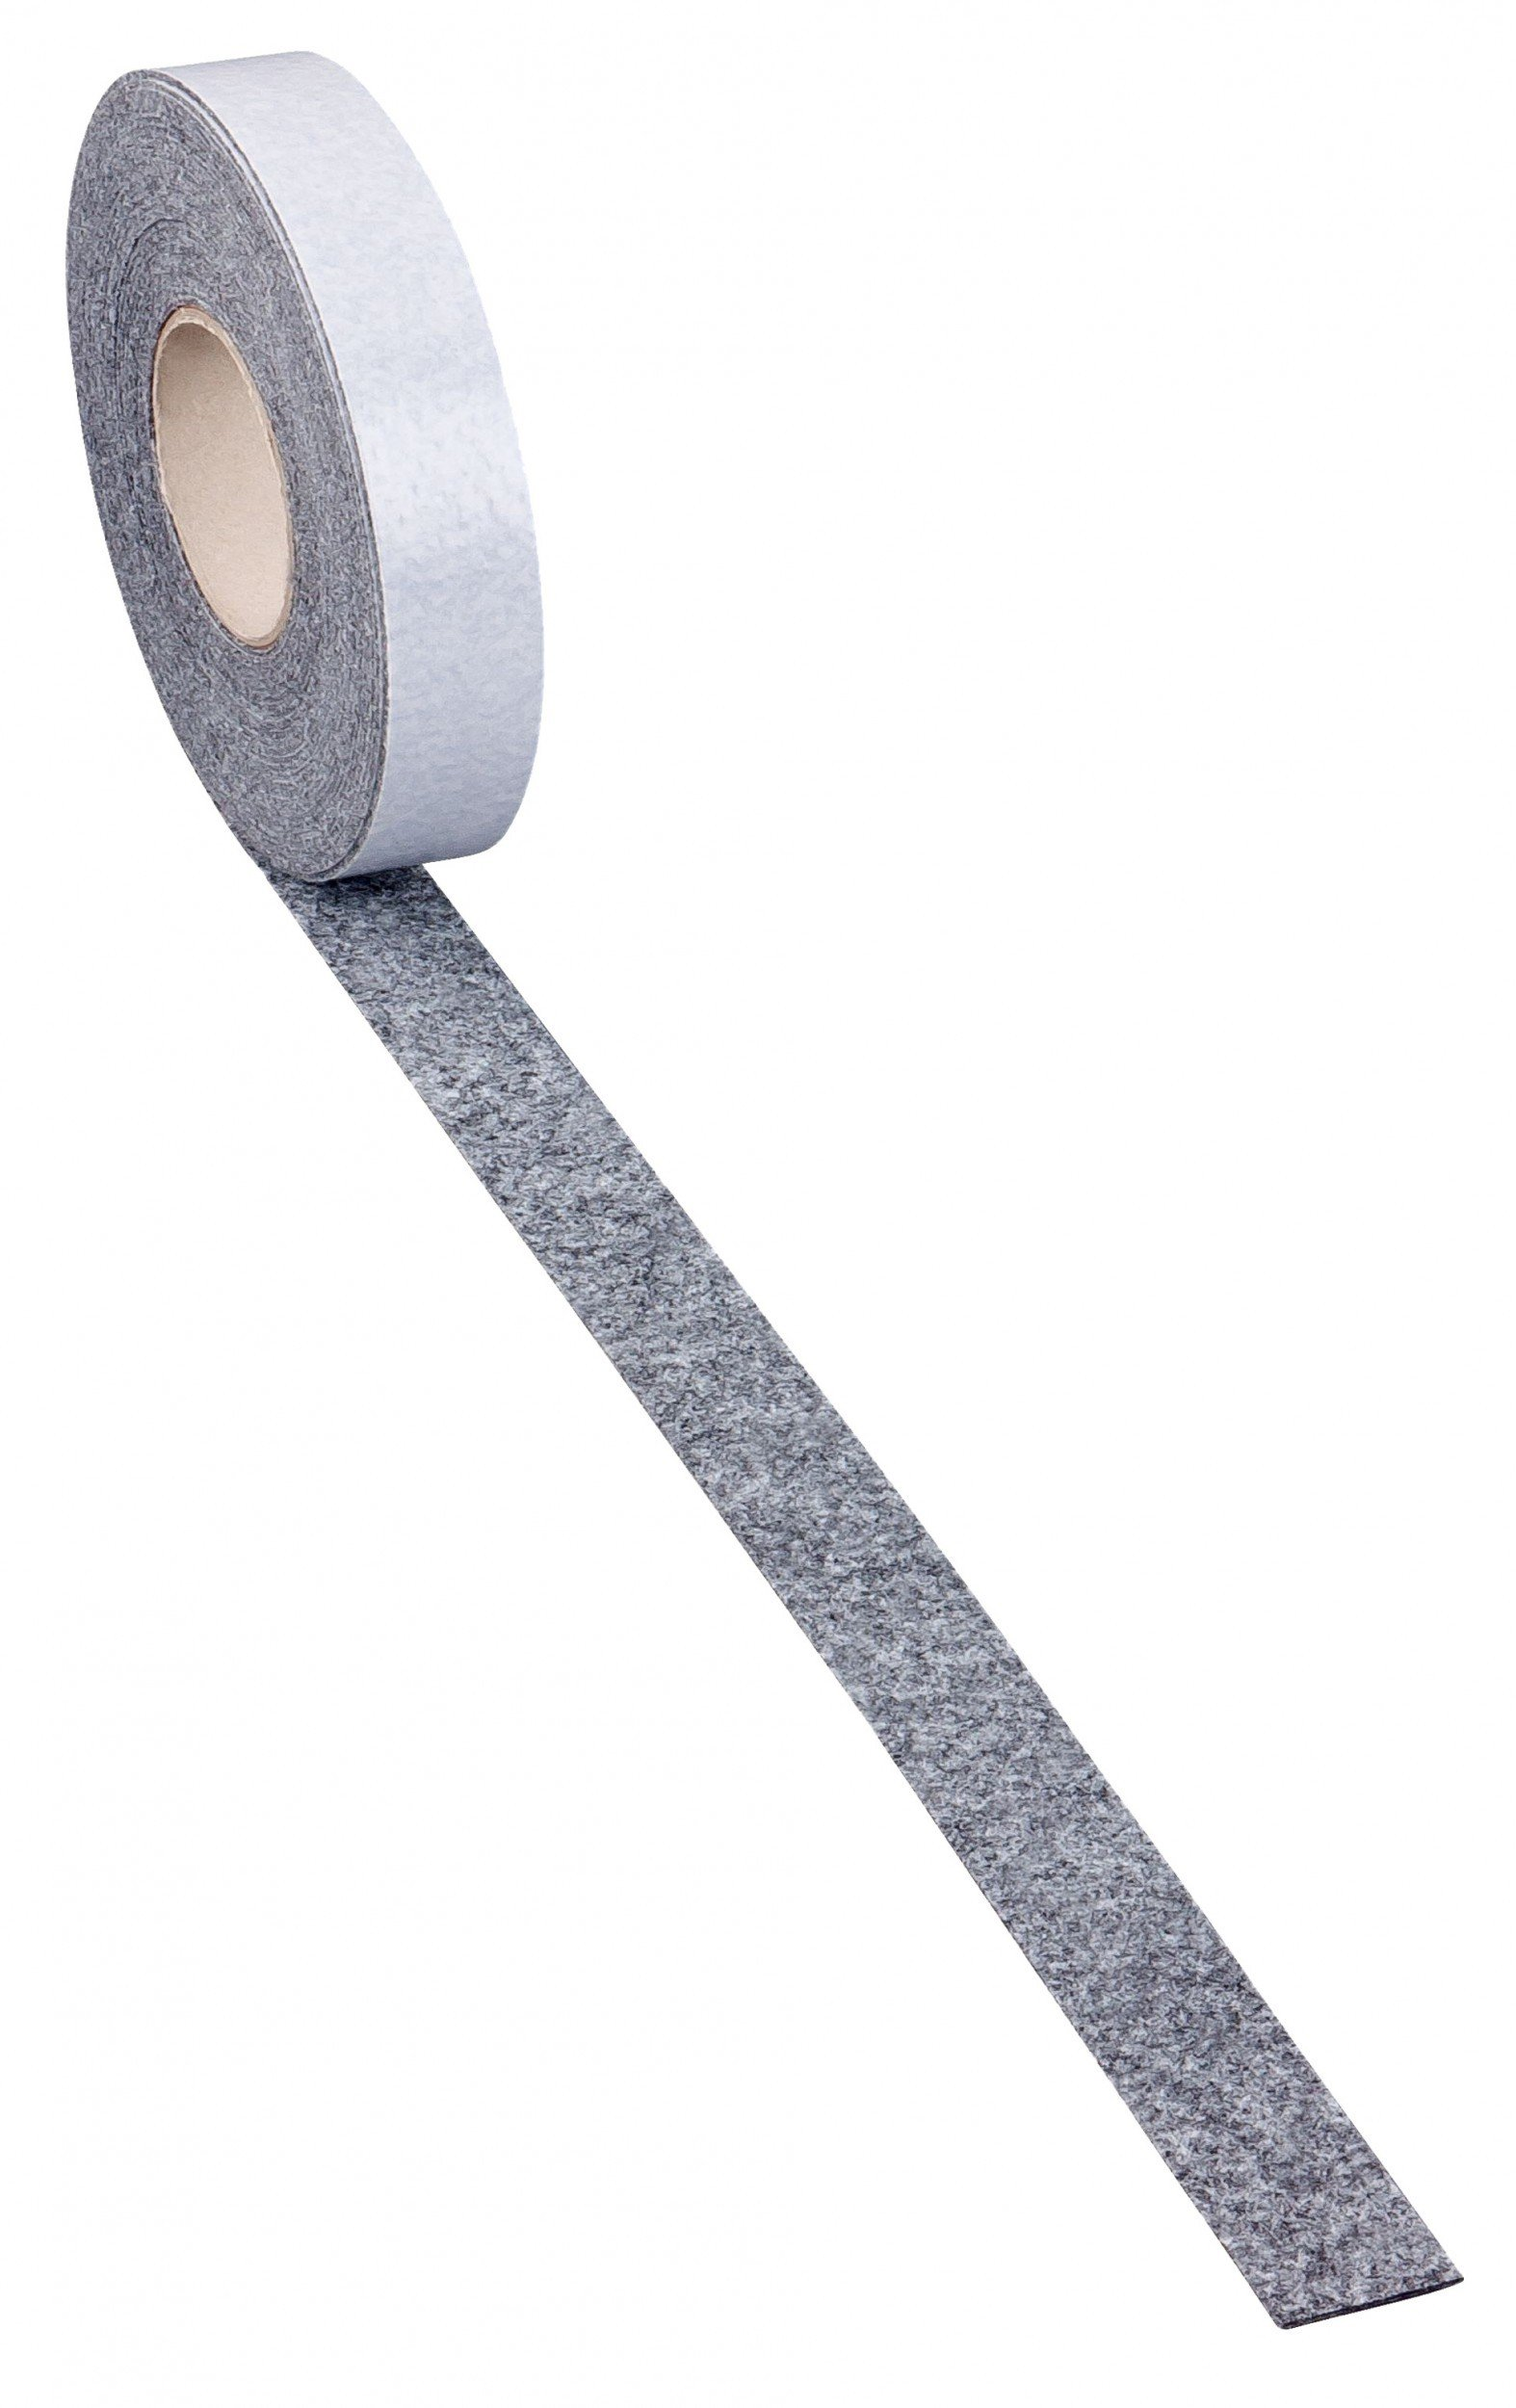 haggiy Felt Strips - self-adhesive Furniture Glides 'Premium' - 0.197'' thick   1.968 in. x 16 ft.